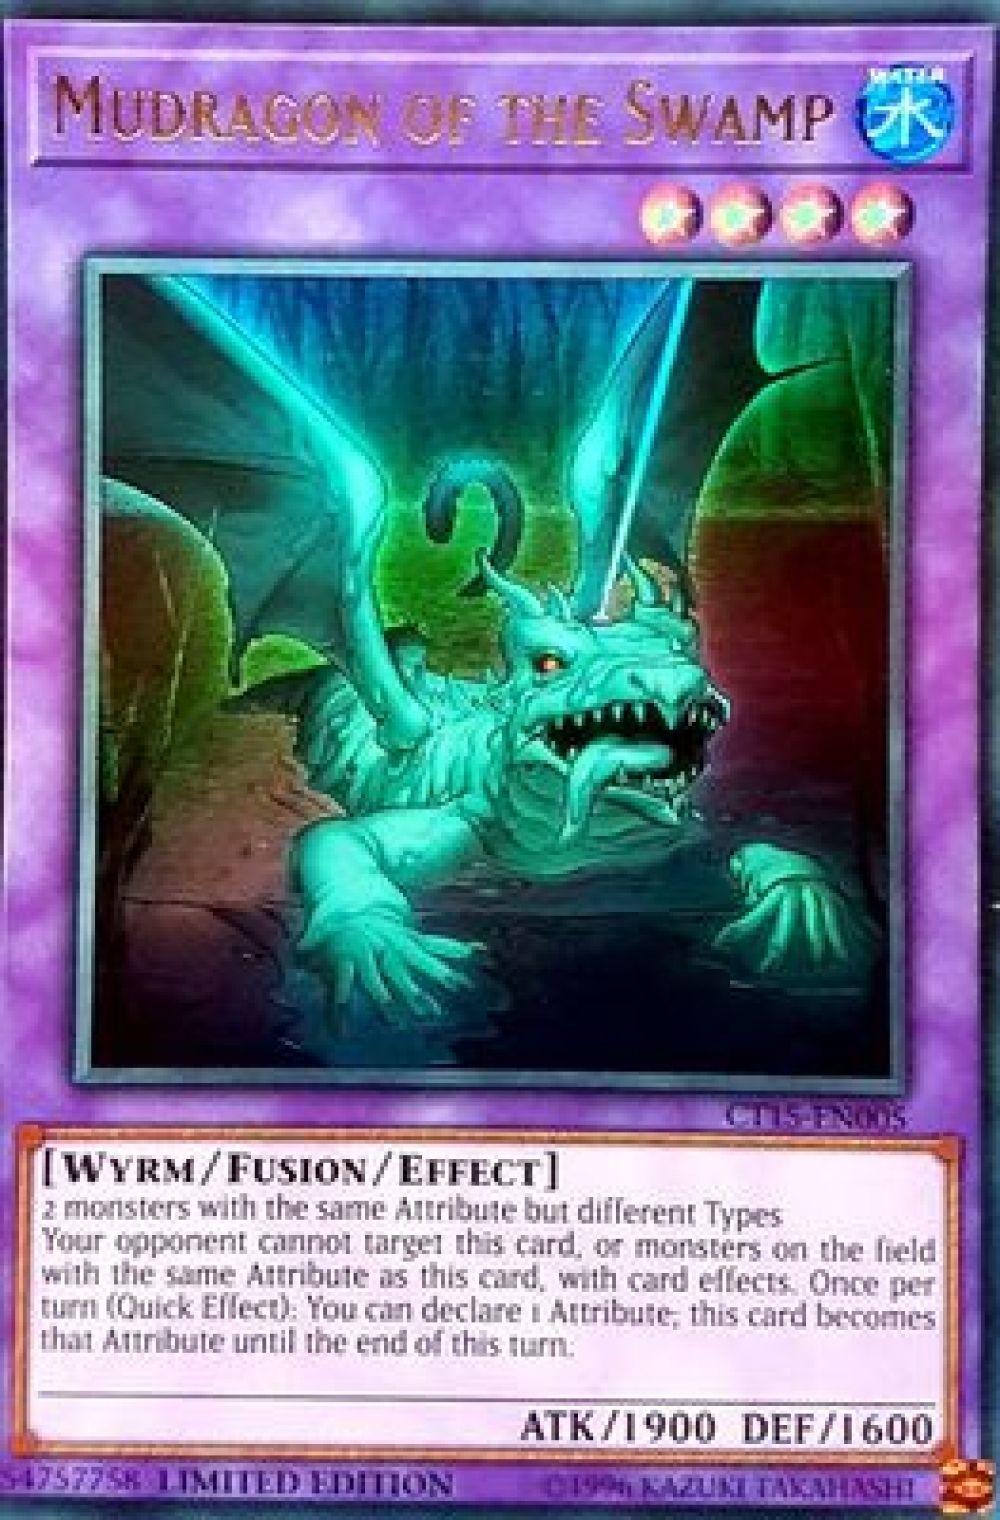 Yu Gi Oh Yugioh Classic Game Card Game English Card Tray And Flash